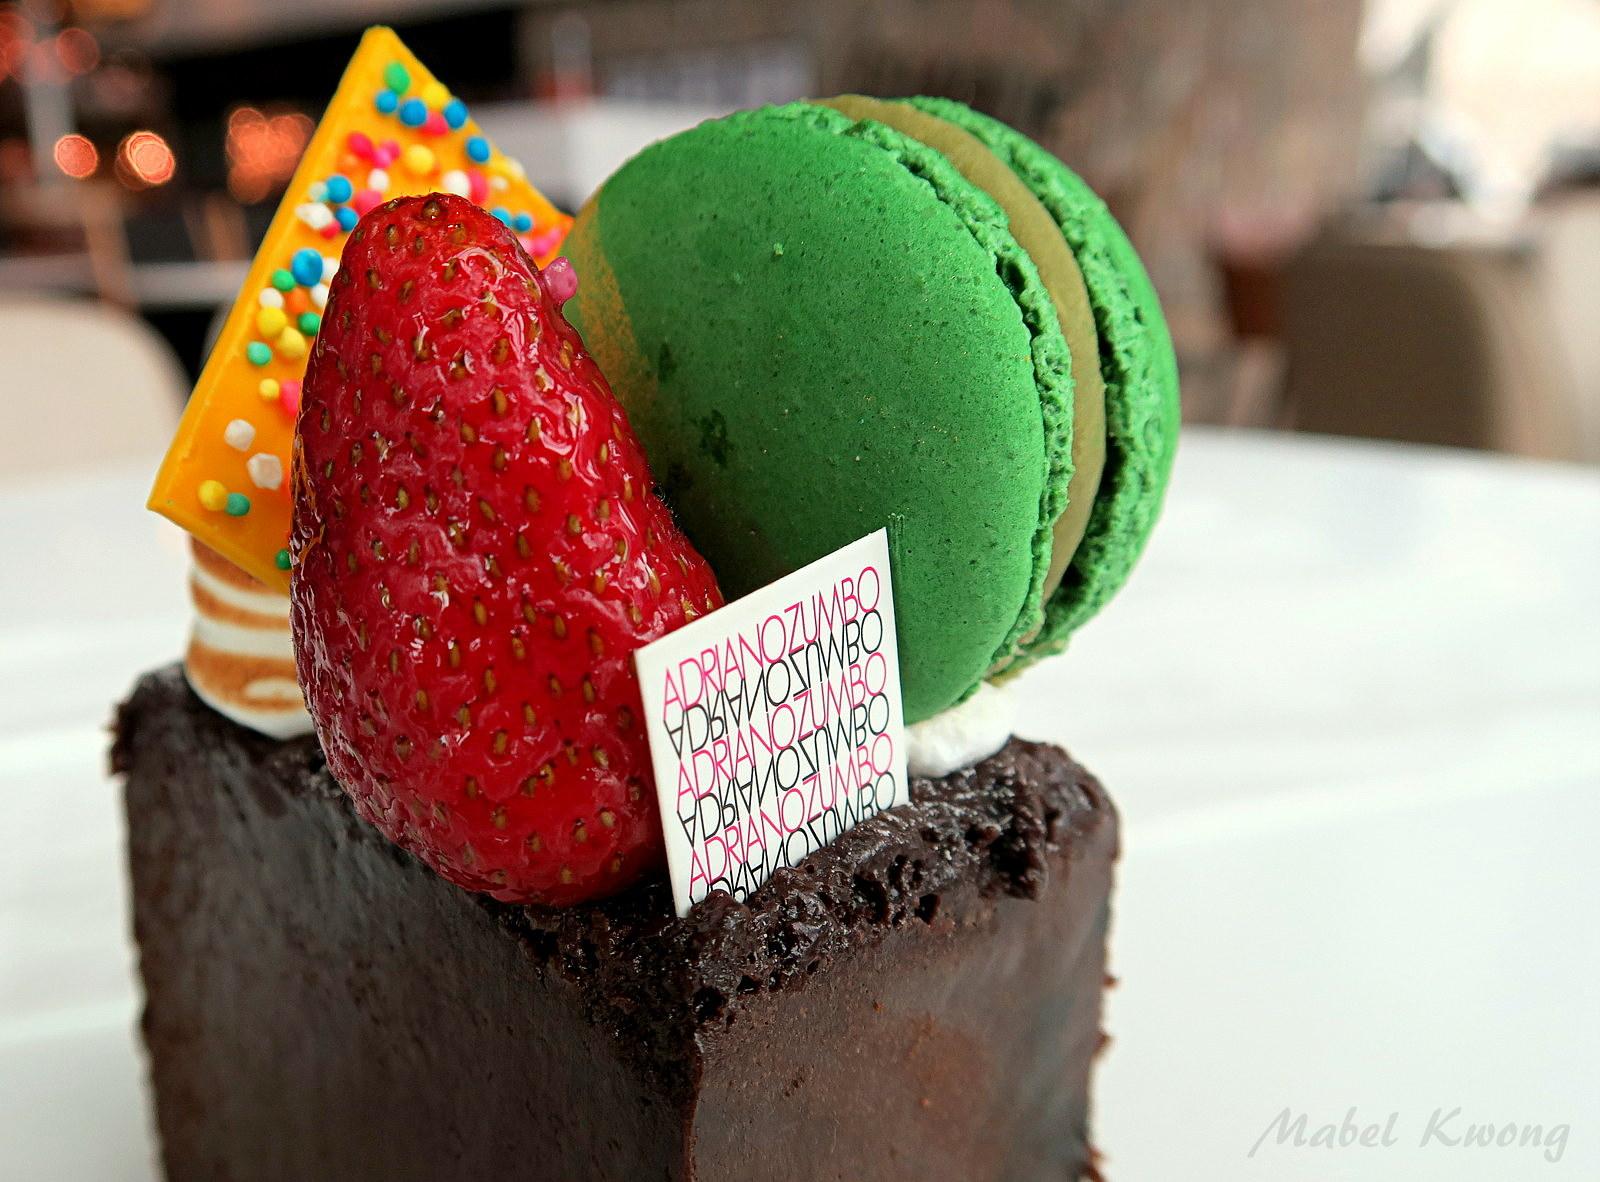 Birthday Cakes Zumbo ~ Flourless chocolate fondant cake. adriano zumbo mabel kwong